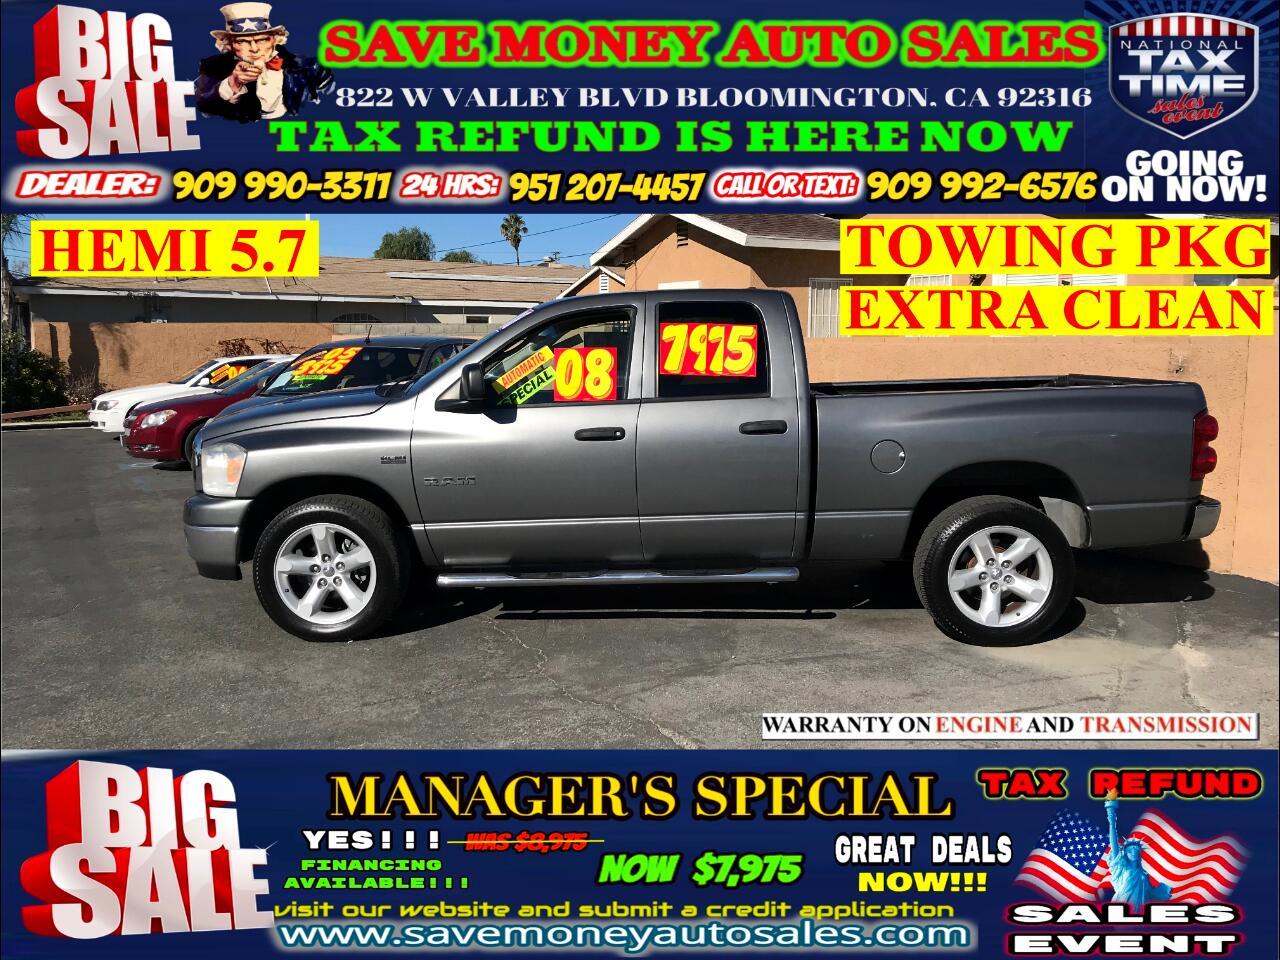 2008 Dodge Ram 1500 SXT QUAD CAB>>HEMI ENGINE 5.7+TOW PACKAGE!!!!